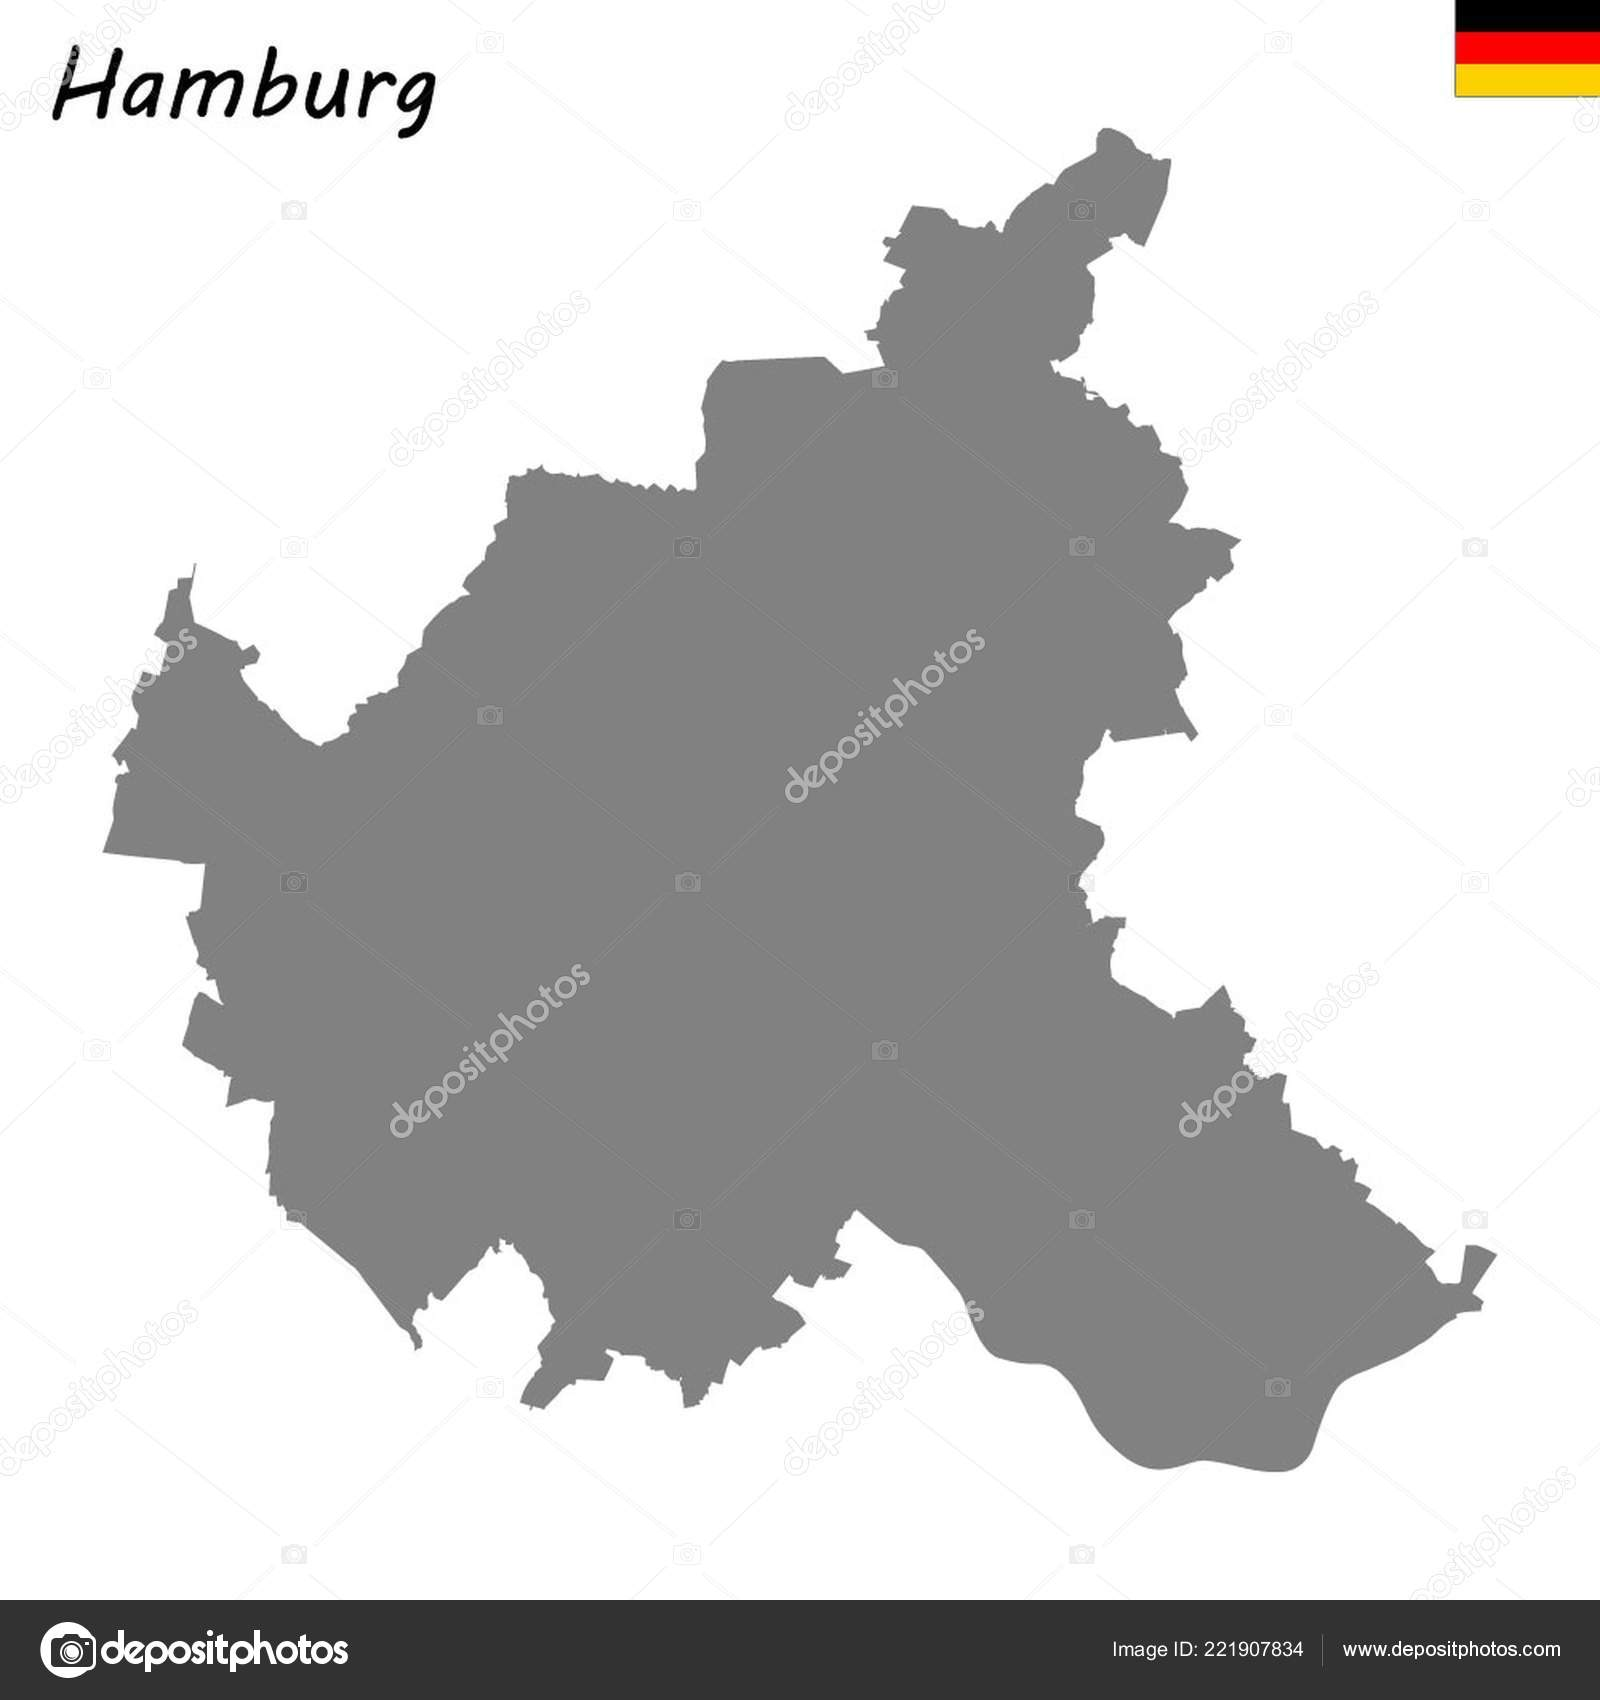 Map Of Germany Hamburg.High Quality Map State Germany Hamburg Stock Vector